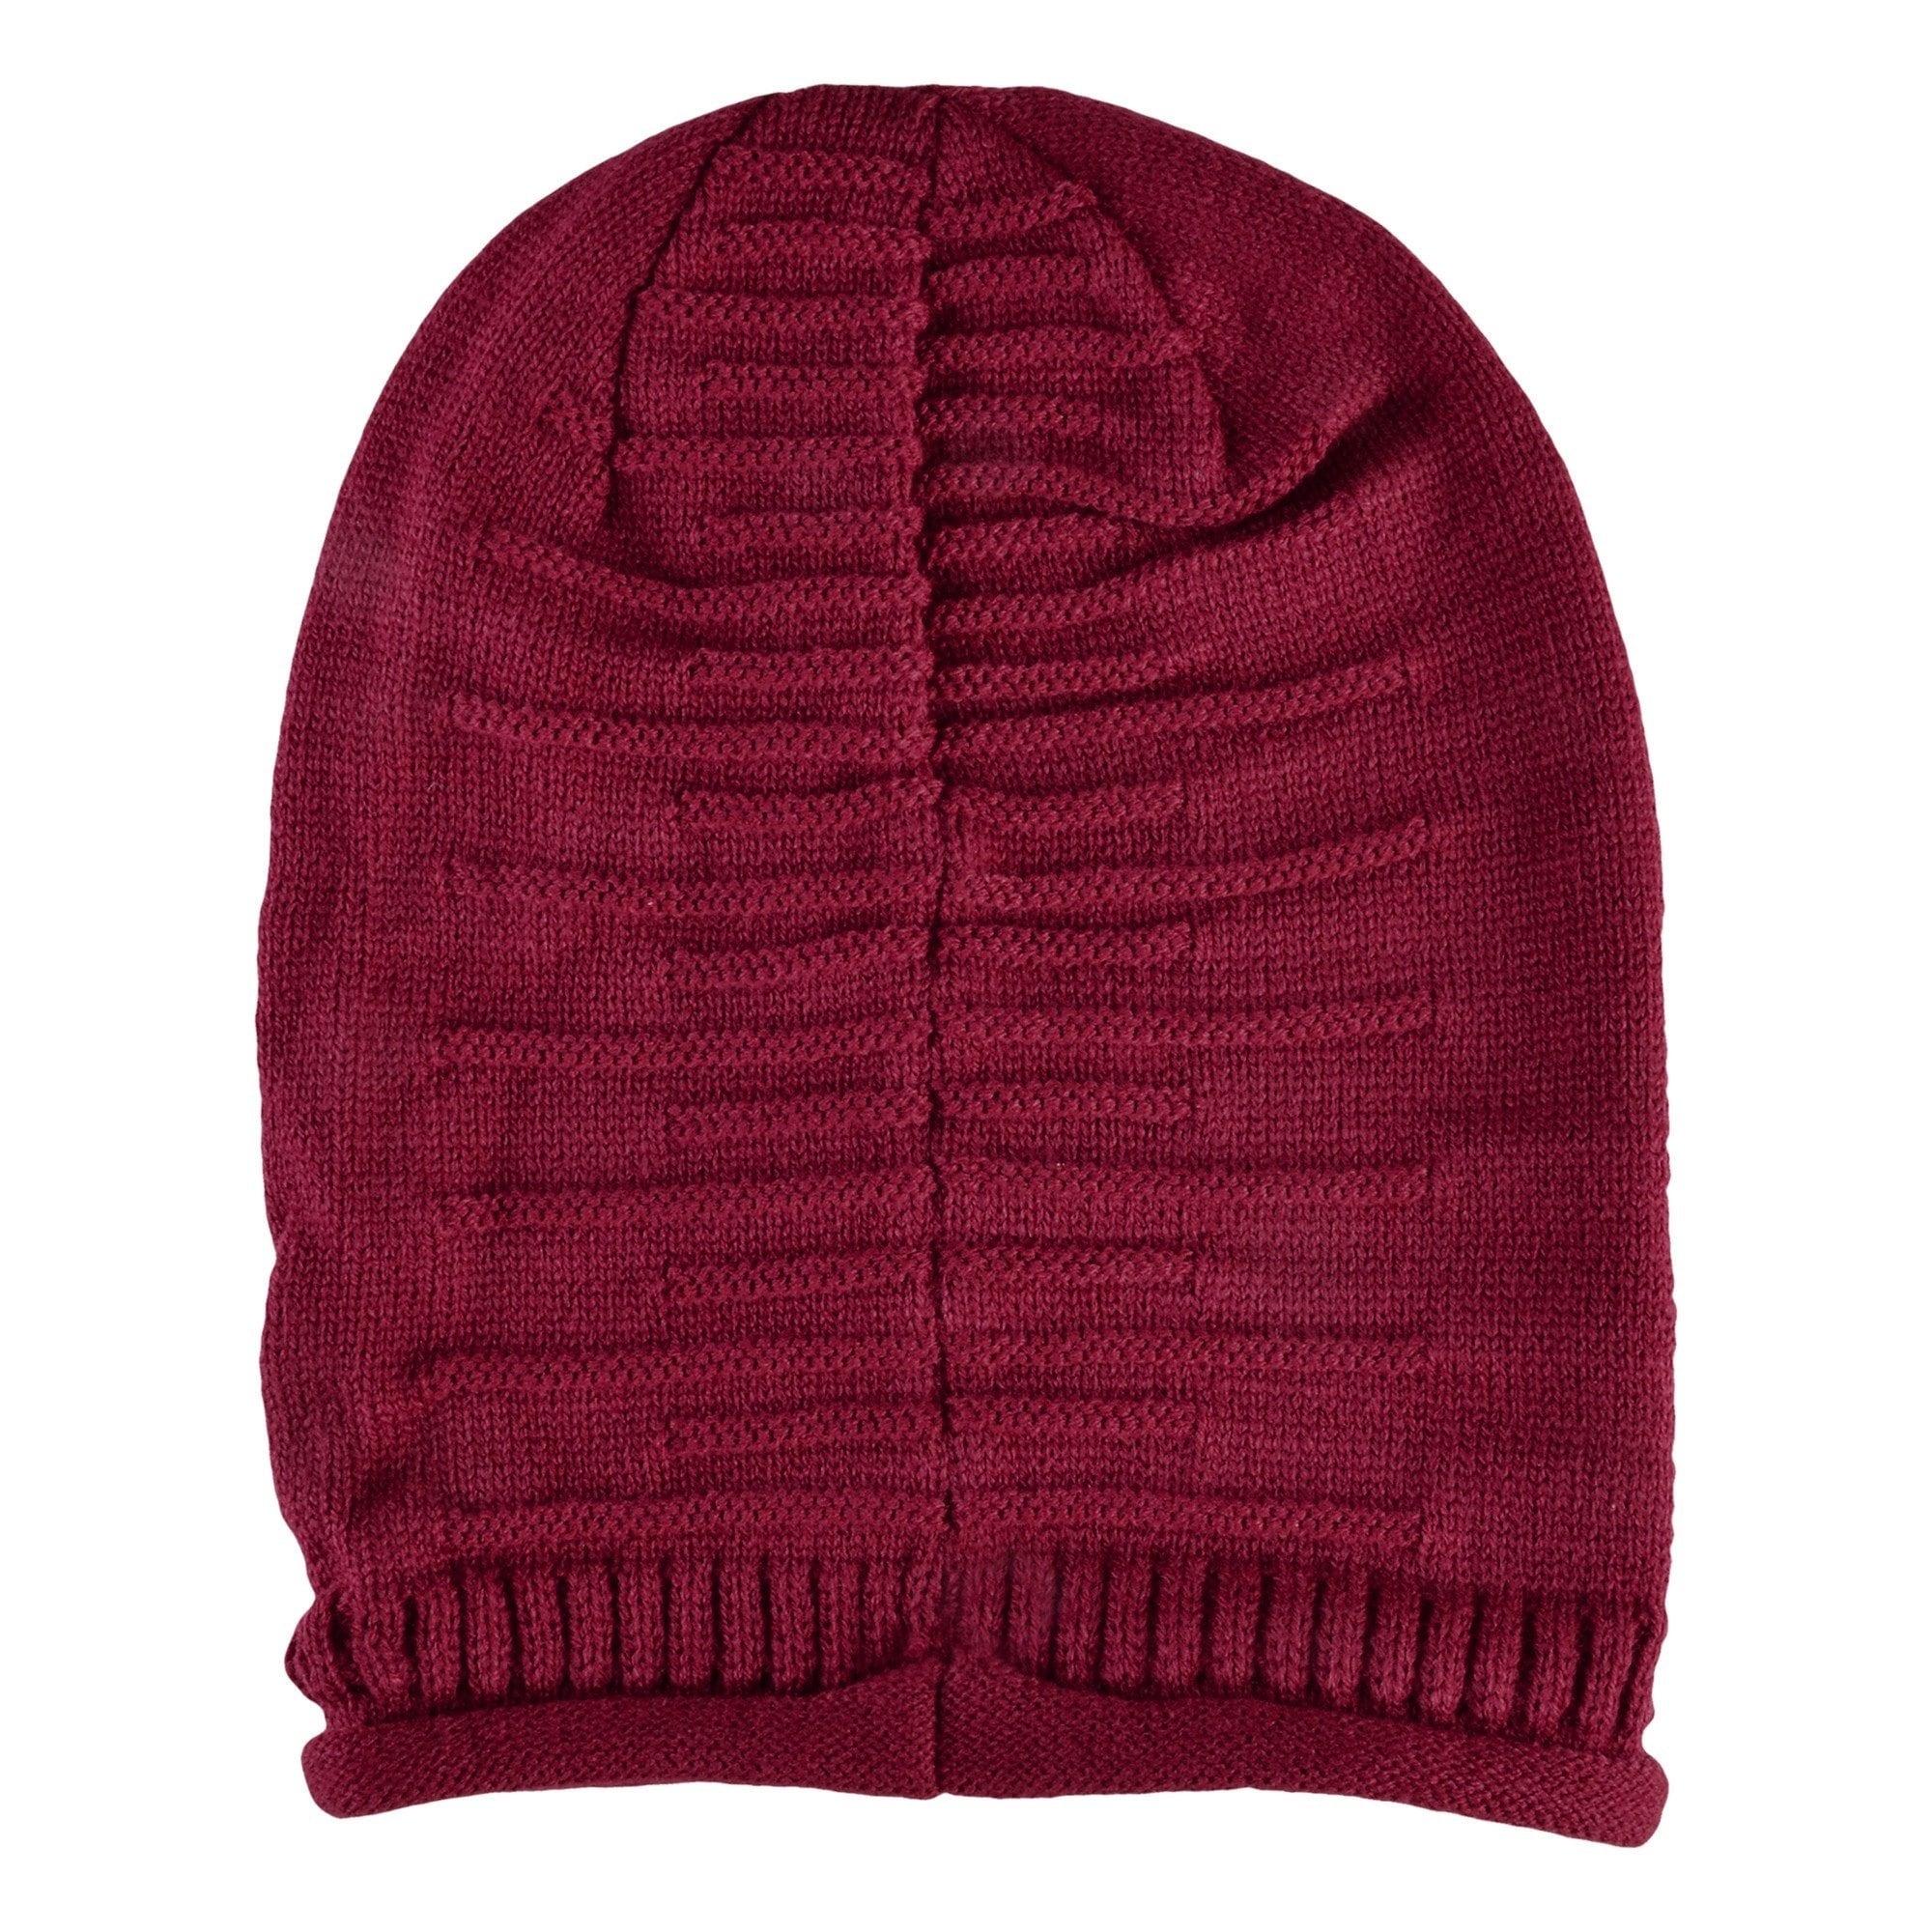 fd392f2d02c Shop Zodaca Trendy Women s Winter Warm Knit Beanie - Free Shipping ...